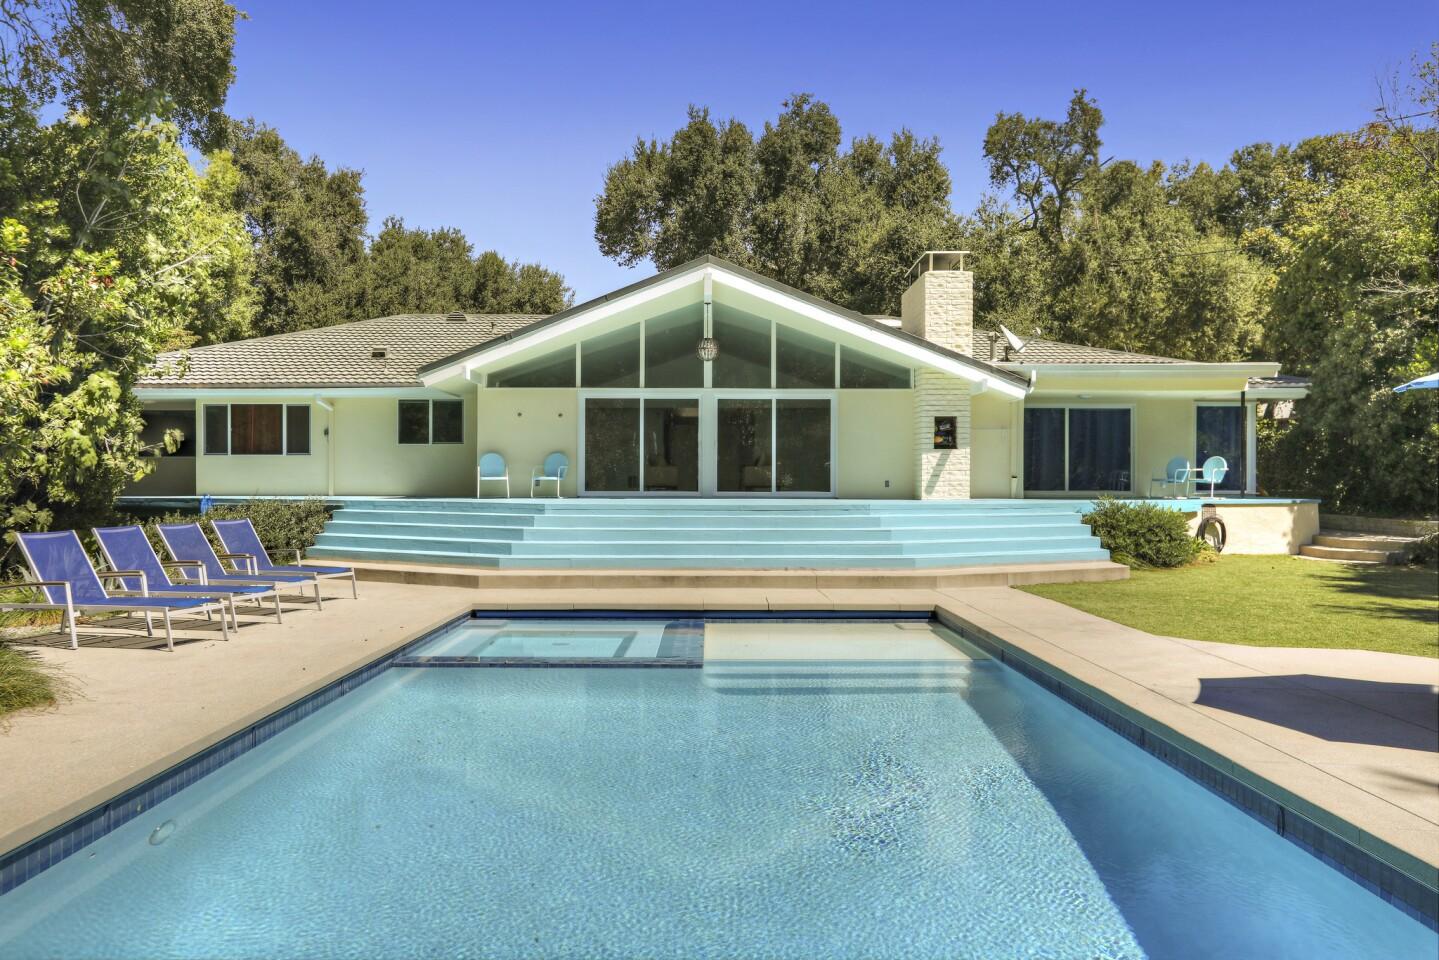 Adam Carolla's La Cañada Flintridge home   Hot Property